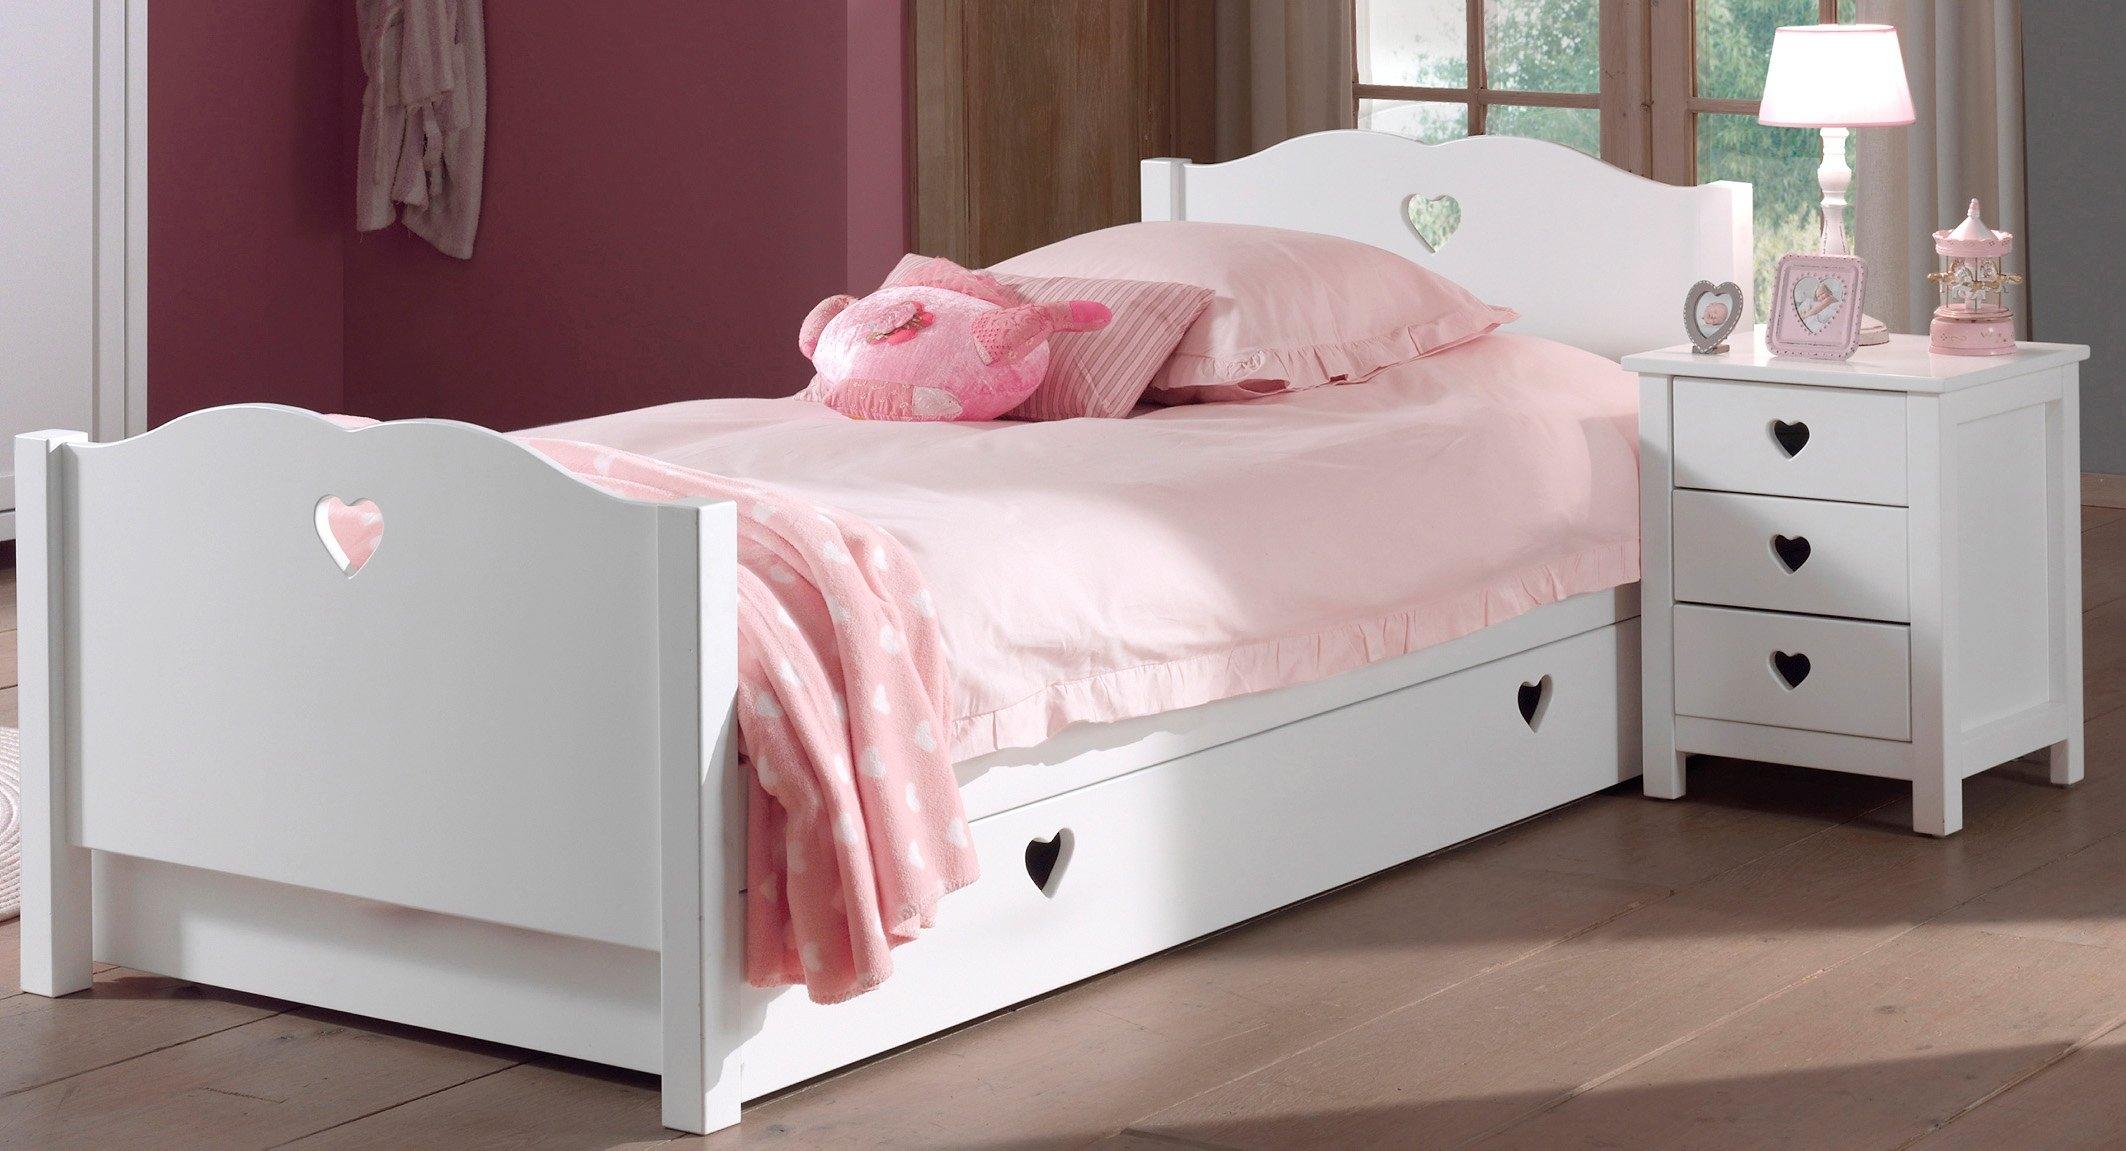 vipack furniture ledikant amori vind je bij otto. Black Bedroom Furniture Sets. Home Design Ideas